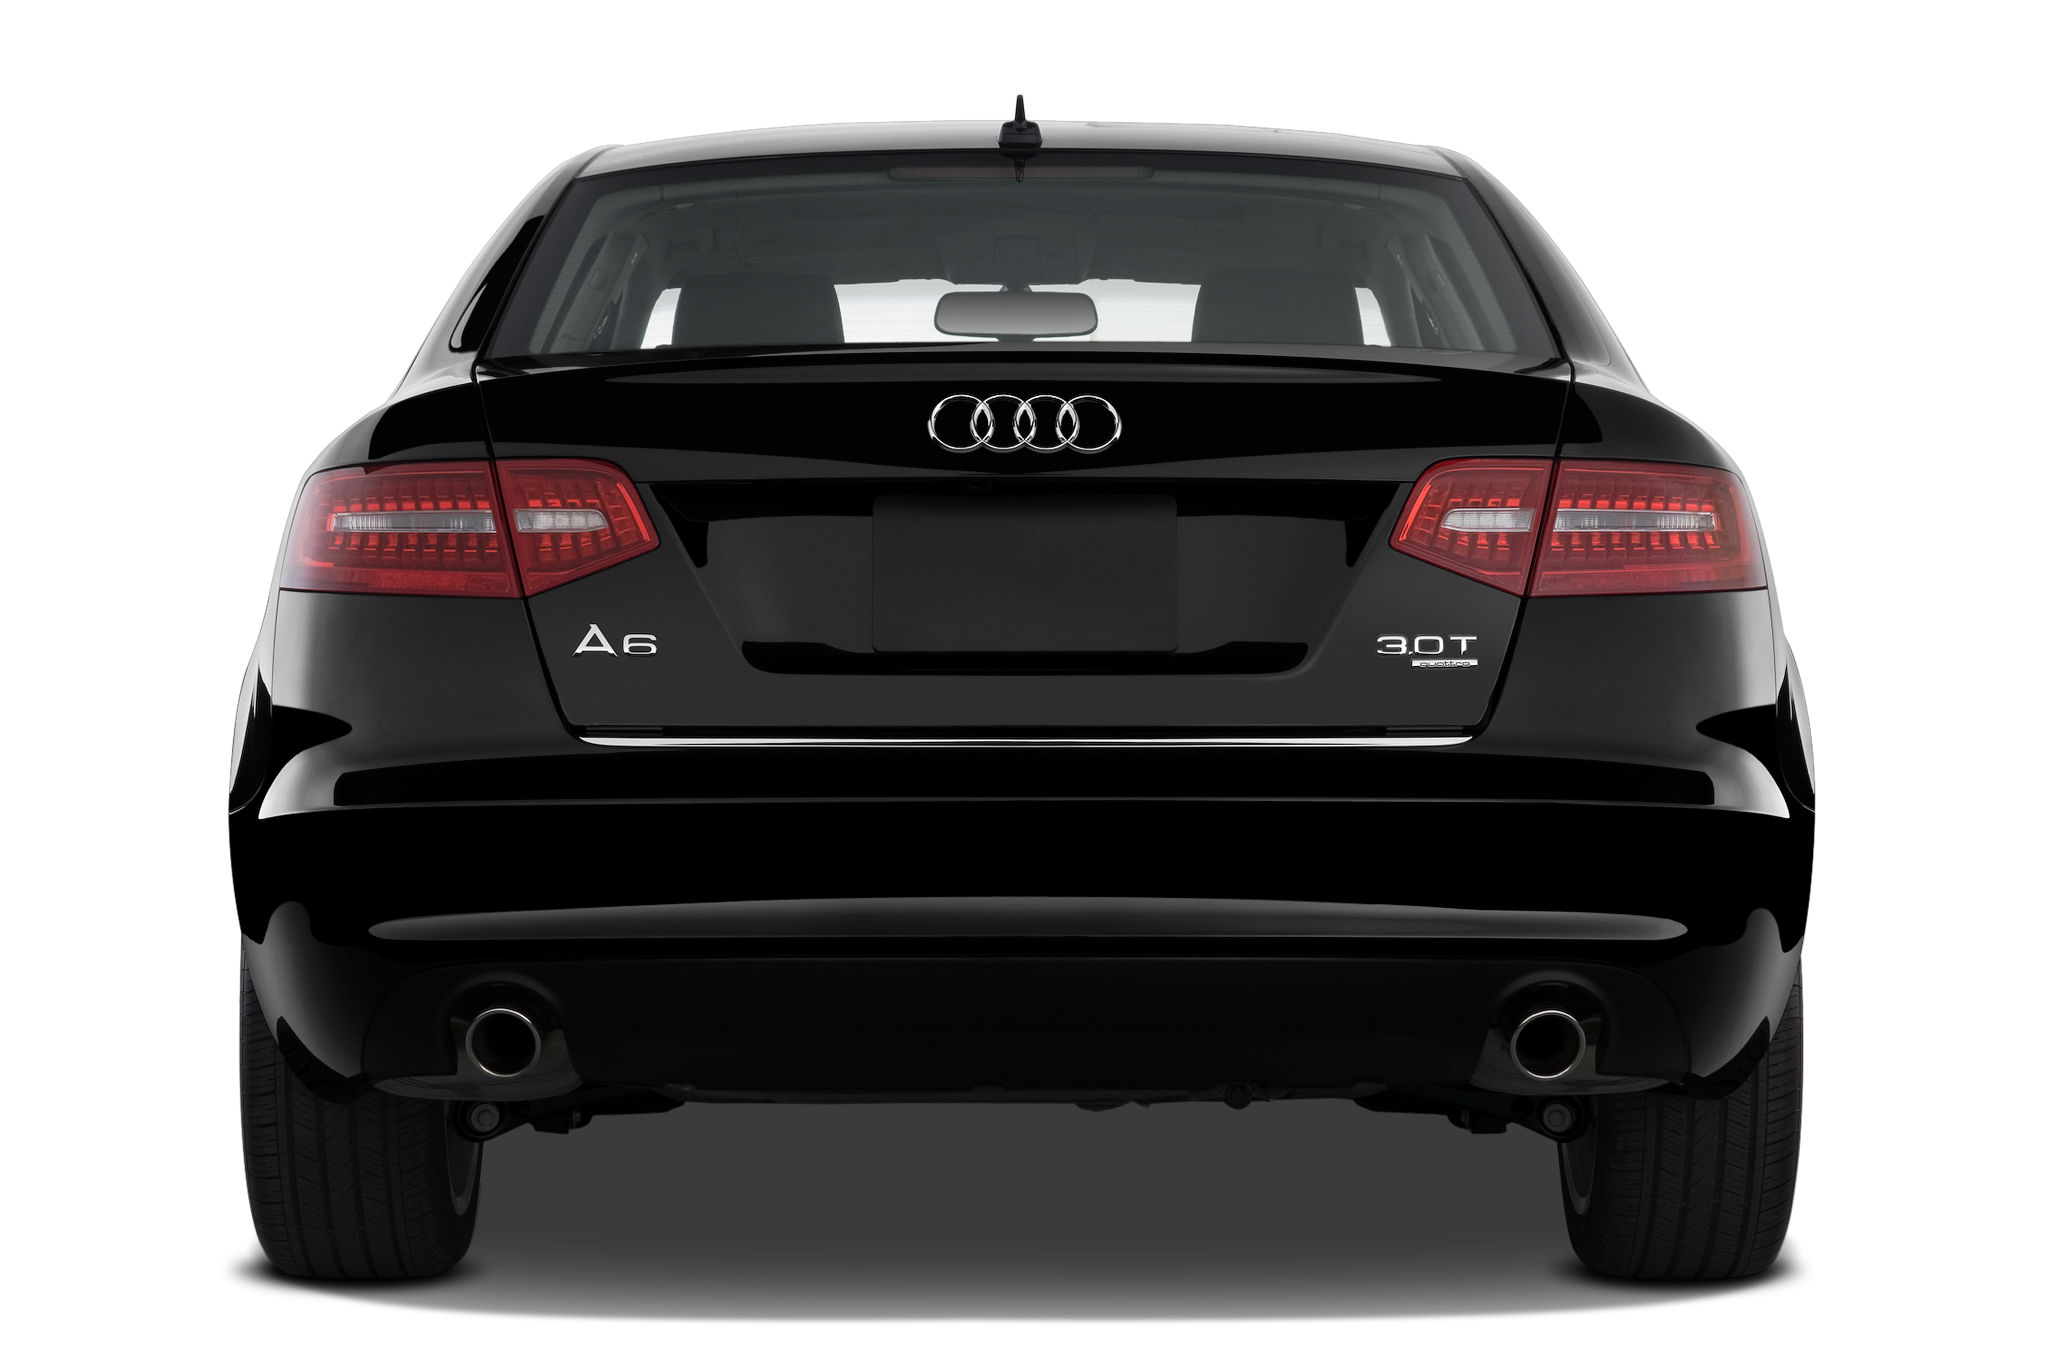 2010 Audi A6 3.0 TFSI Quattro - Audi Luxury Sedan Review ... Audi A Black Lights on audi from lights, audi swarm lights, audi a5 lights, audi s3 lights, bmw 3 series lights, lexus gs 350 lights, land rover 110 lights, audi s7 lights, jaguar s type lights, audi service lights, bmw 5 series lights, land rover lr3 lights, ford super duty lights, ford ranger lights, bmw 7 series lights, acura tl lights, audi q headlights, saab 9-2x lights, nissan altima lights, hyundai sonata lights,